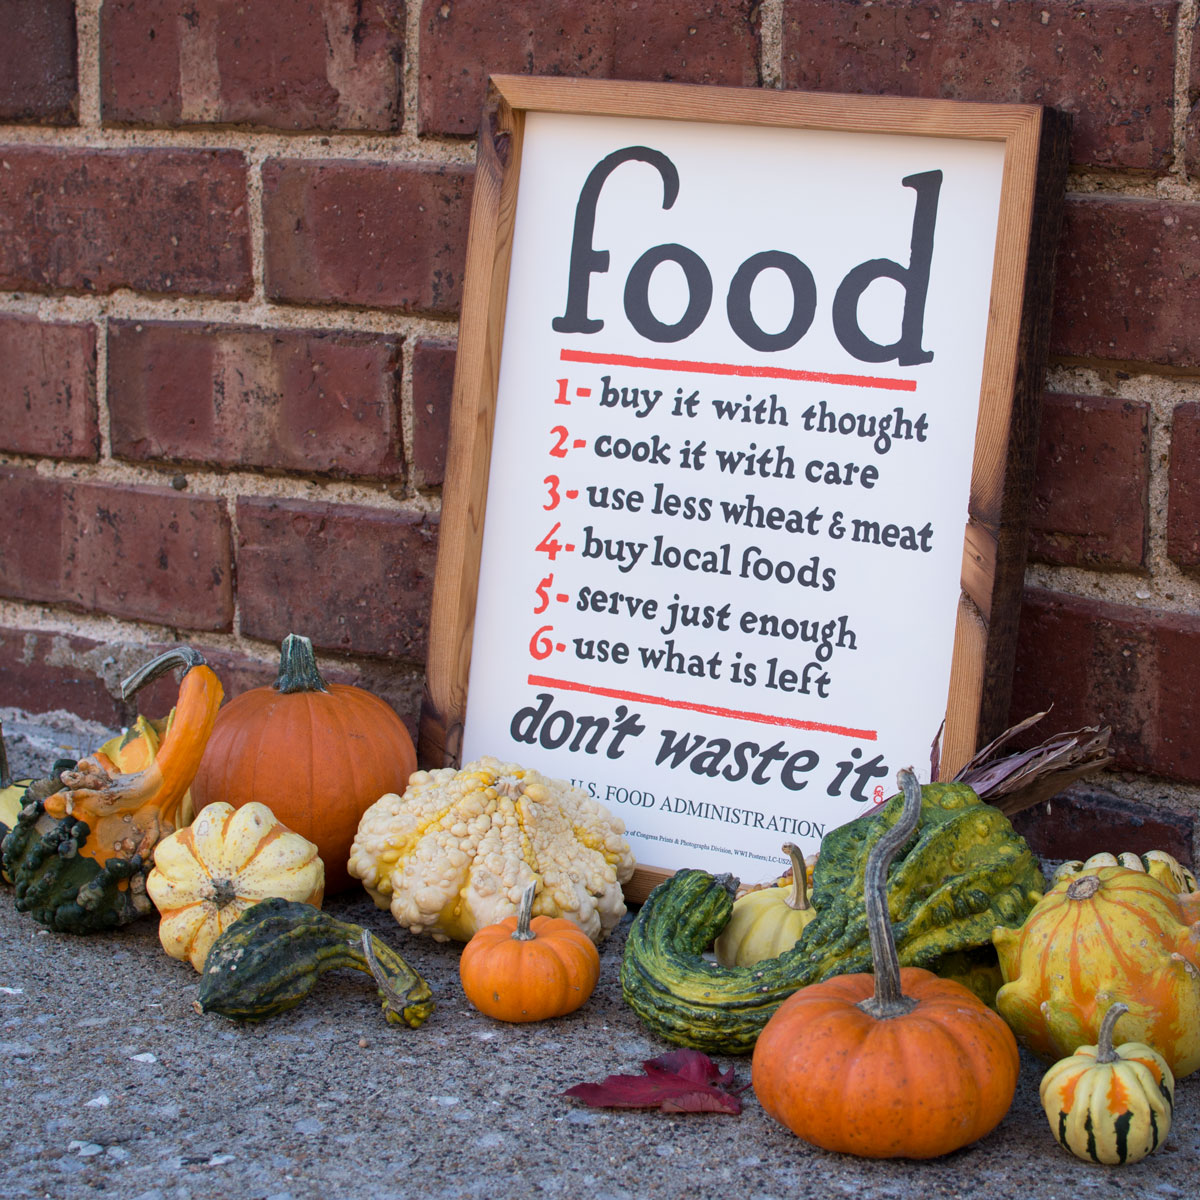 lg-food-rules-brick-wall-angle-1200px.jpg